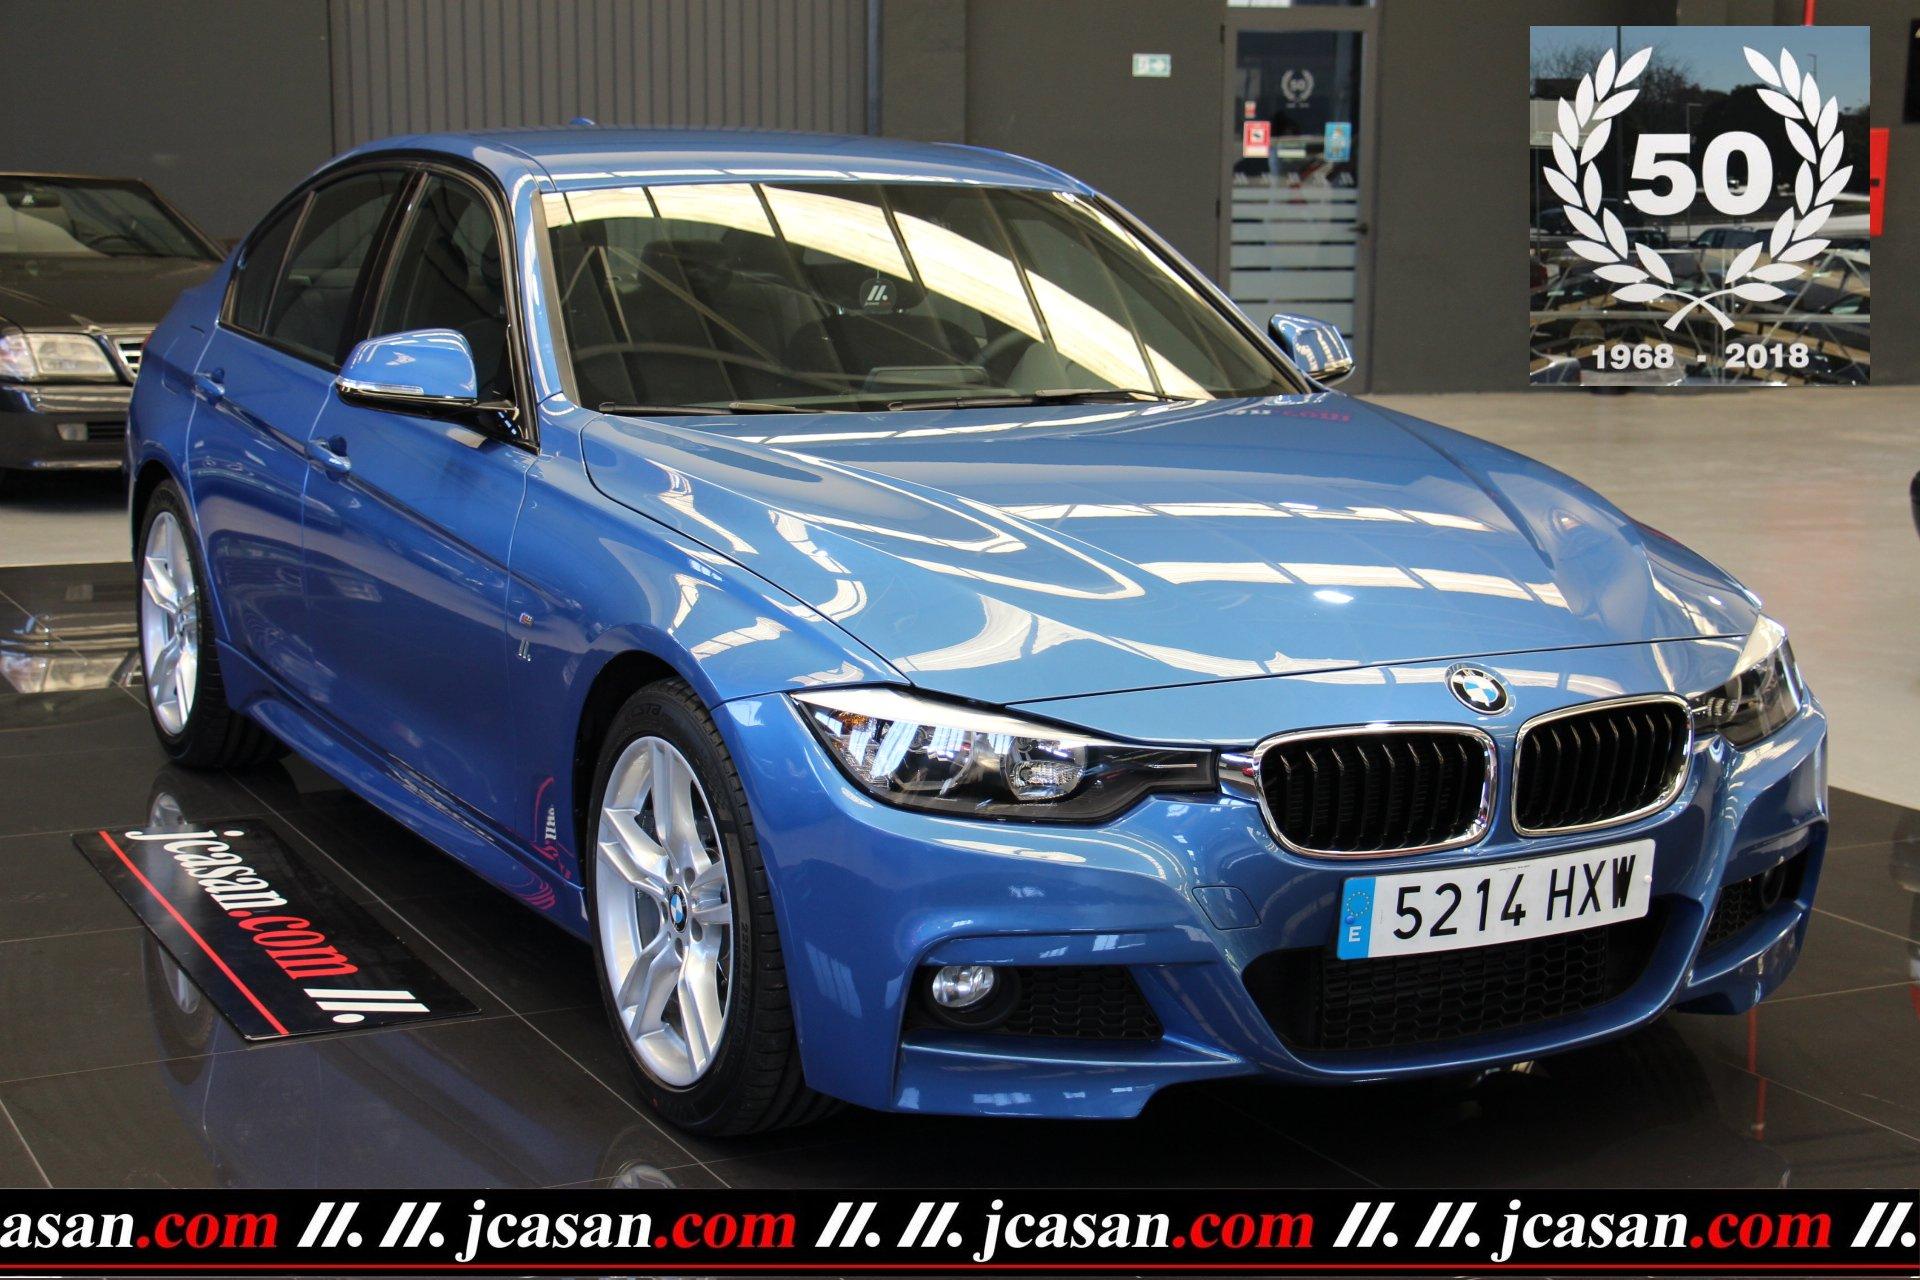 BMW 316d 116 CV M SPORT EDITION 6 Vel